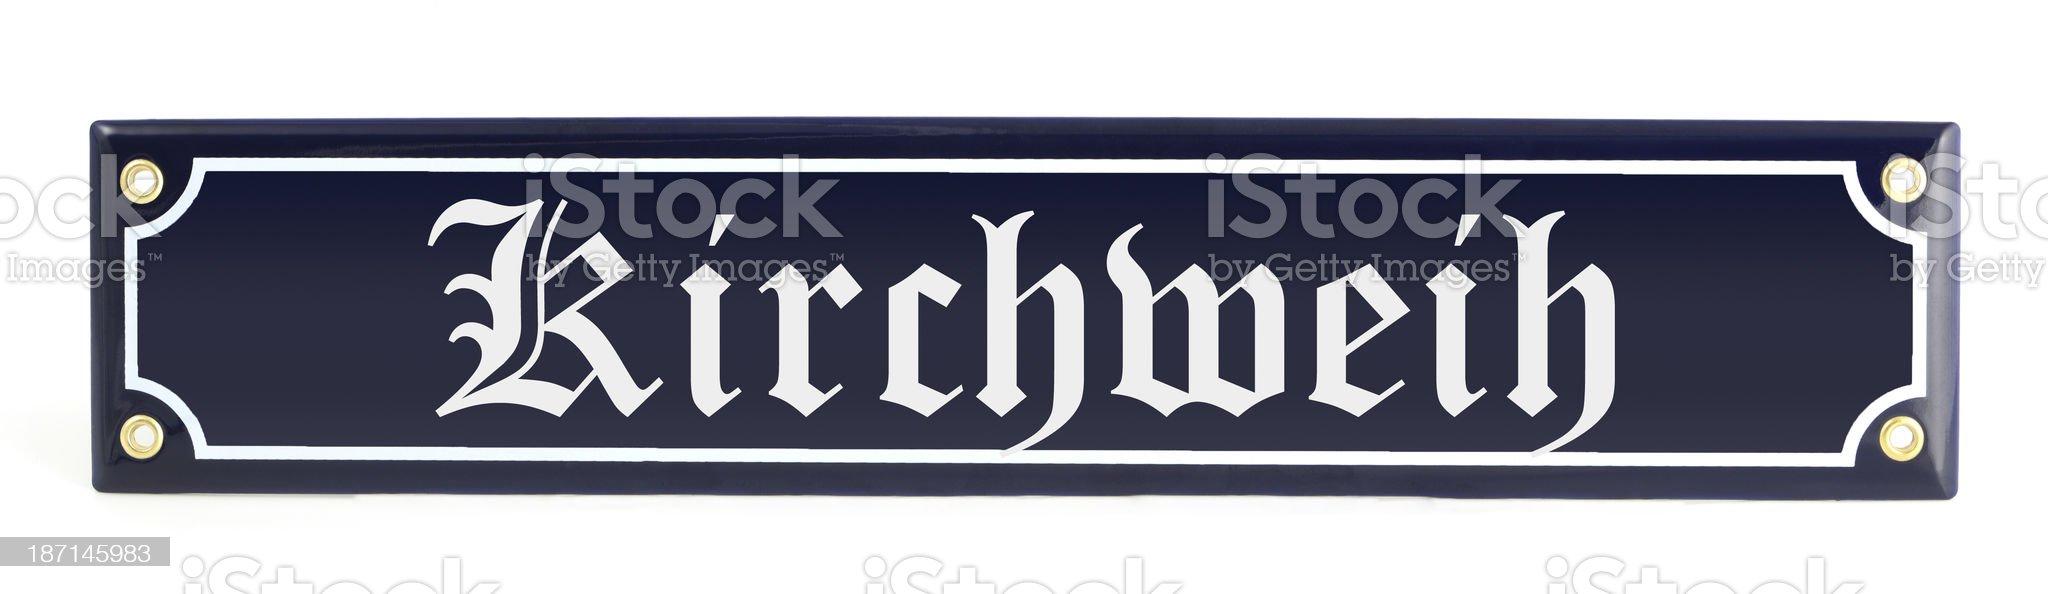 Information sign Kirchweih royalty-free stock photo